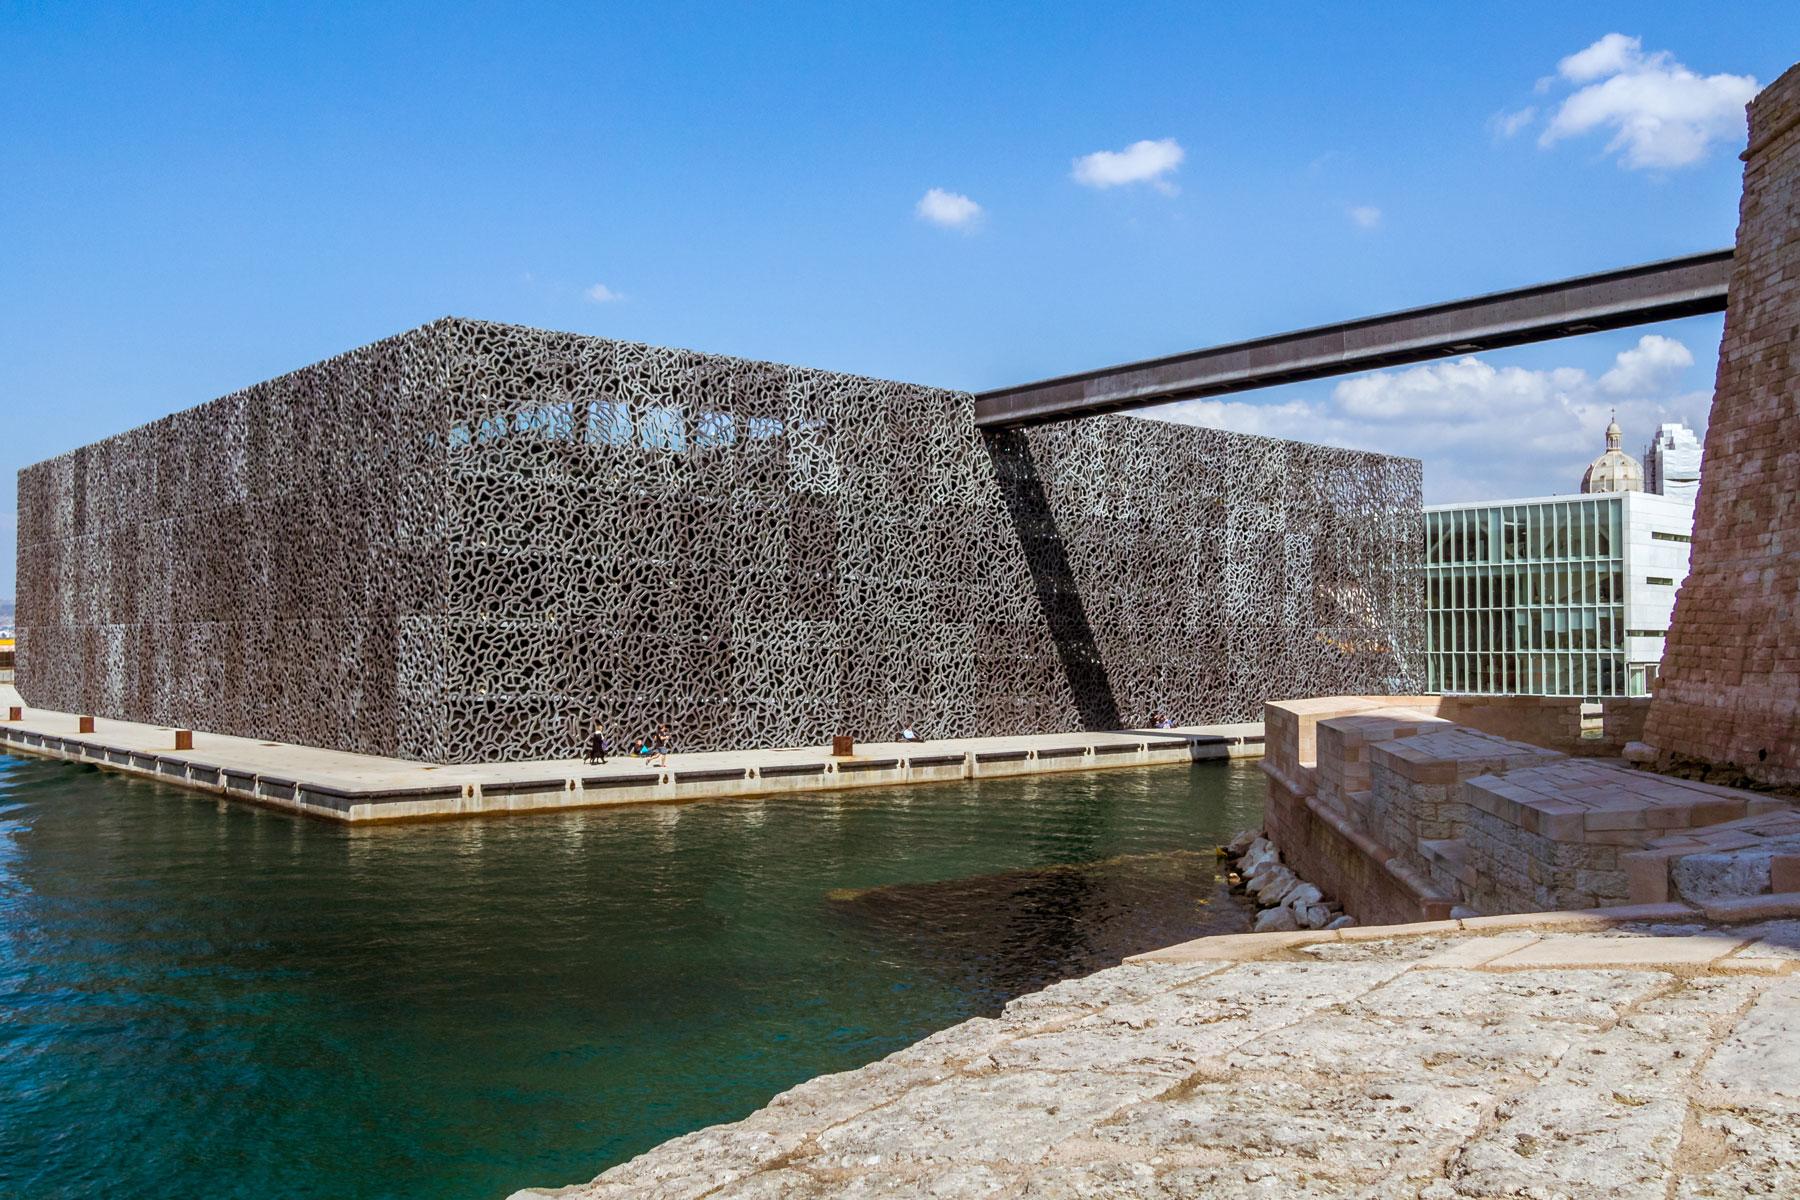 MuCEM museum in Marseille, France